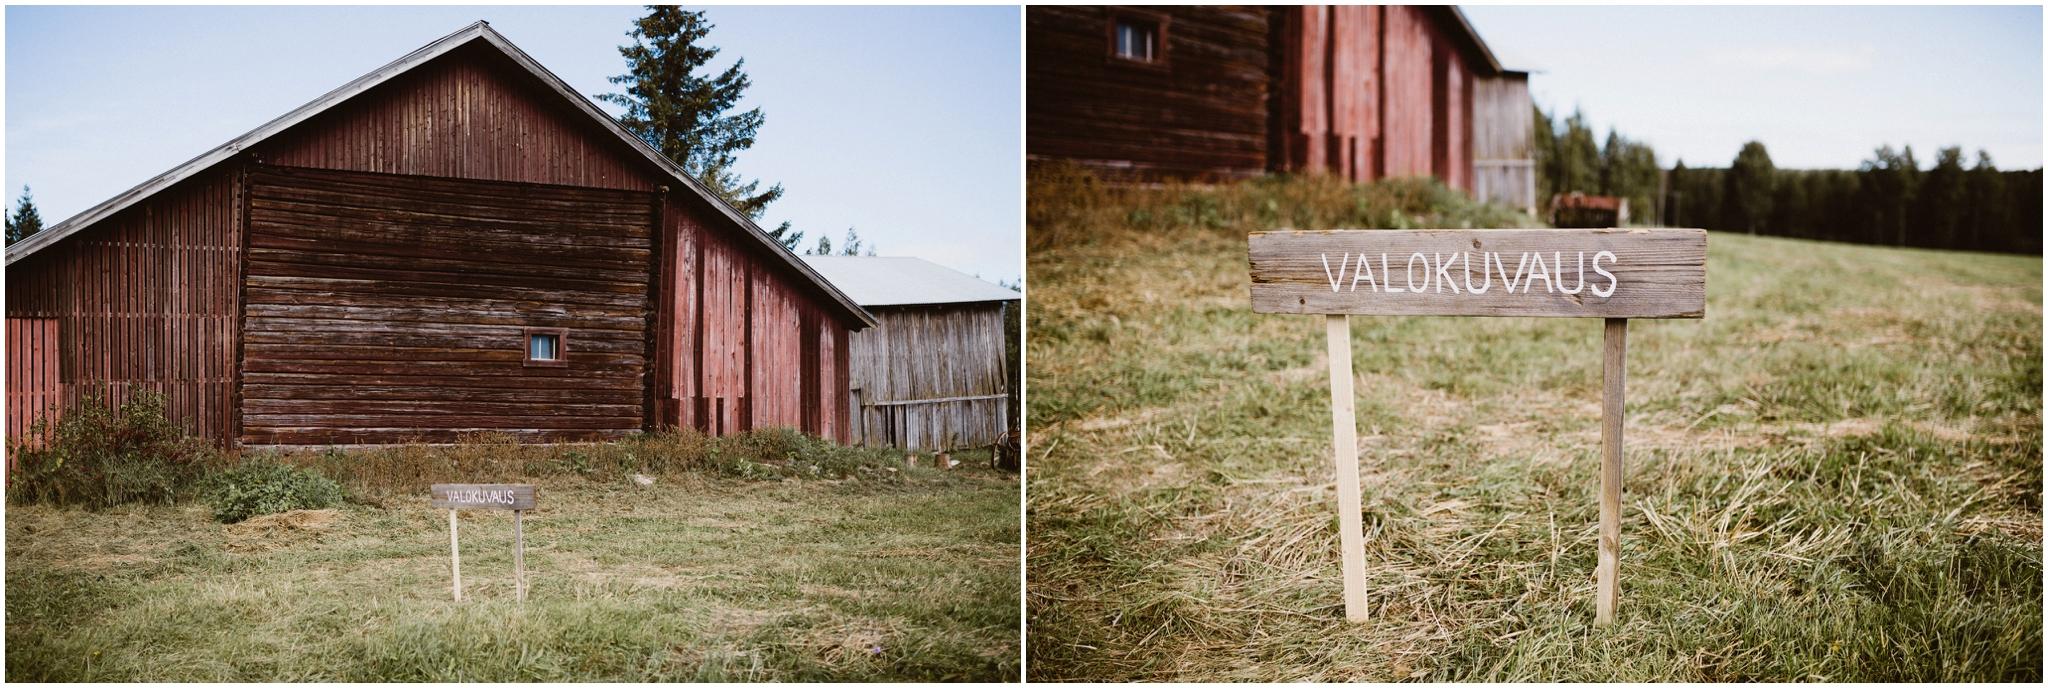 Leevi + Susanna -- Patrick Karkkolainen Wedding Photographer + Adventurer-24.jpg